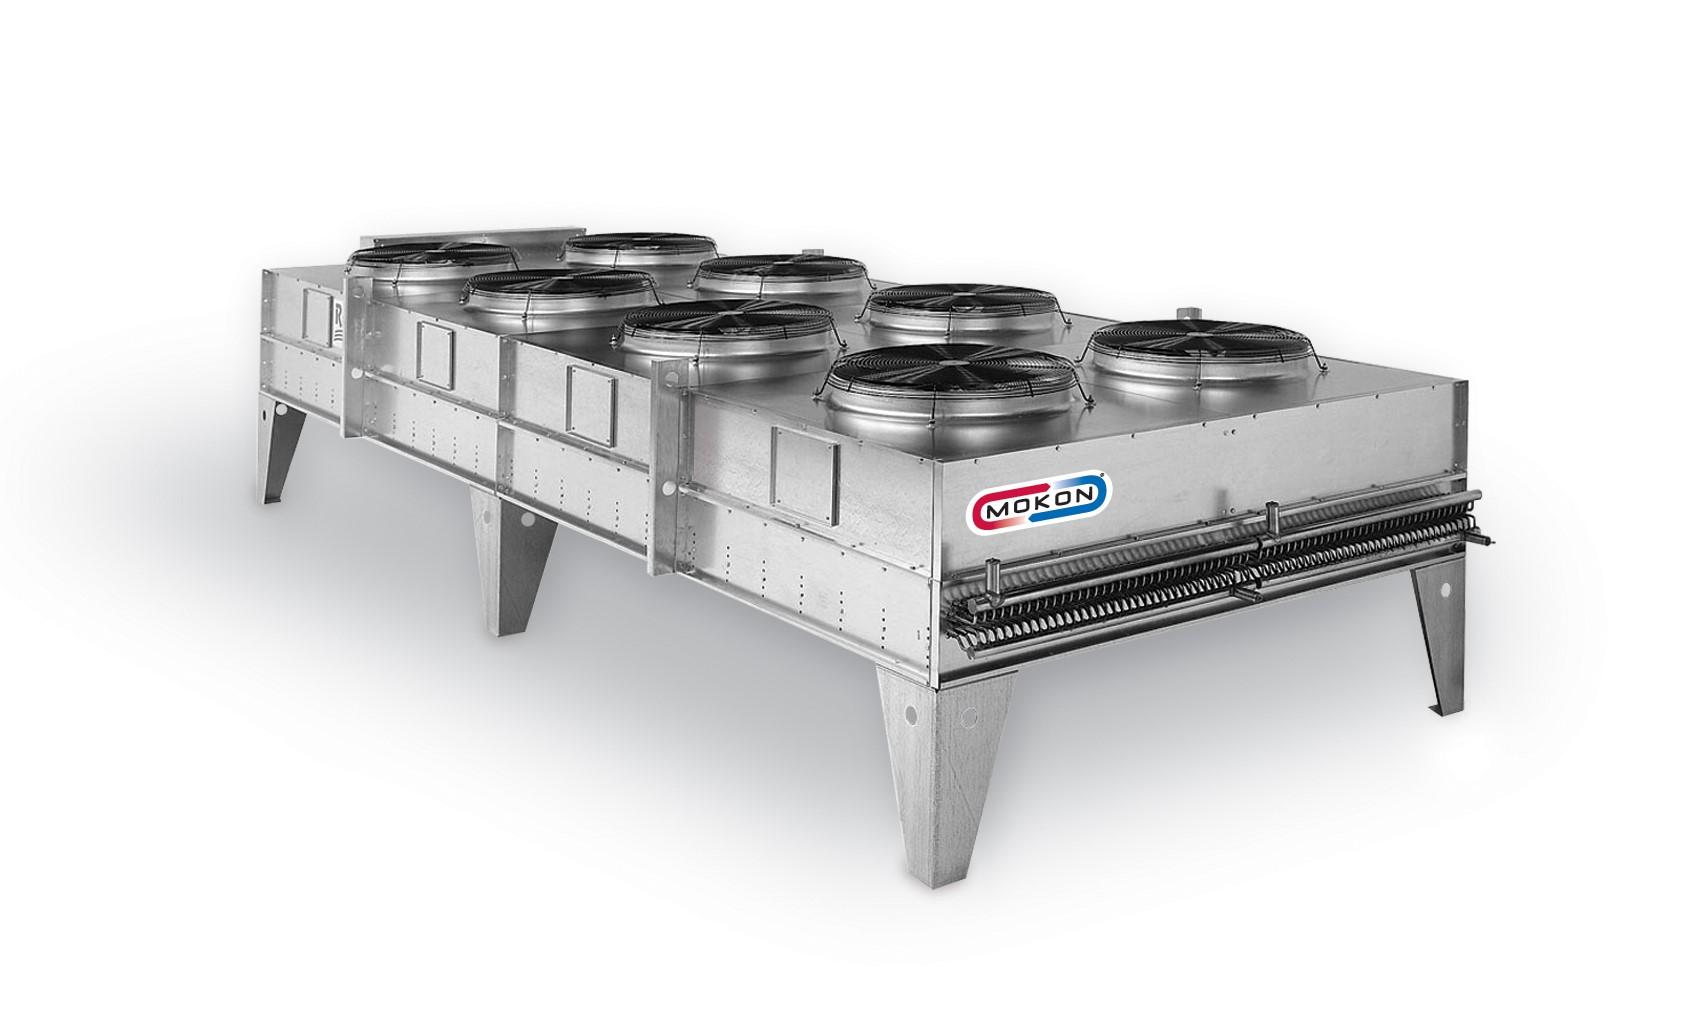 Air Cooler Condenser : Liquid temperature control leader mokon celebrates